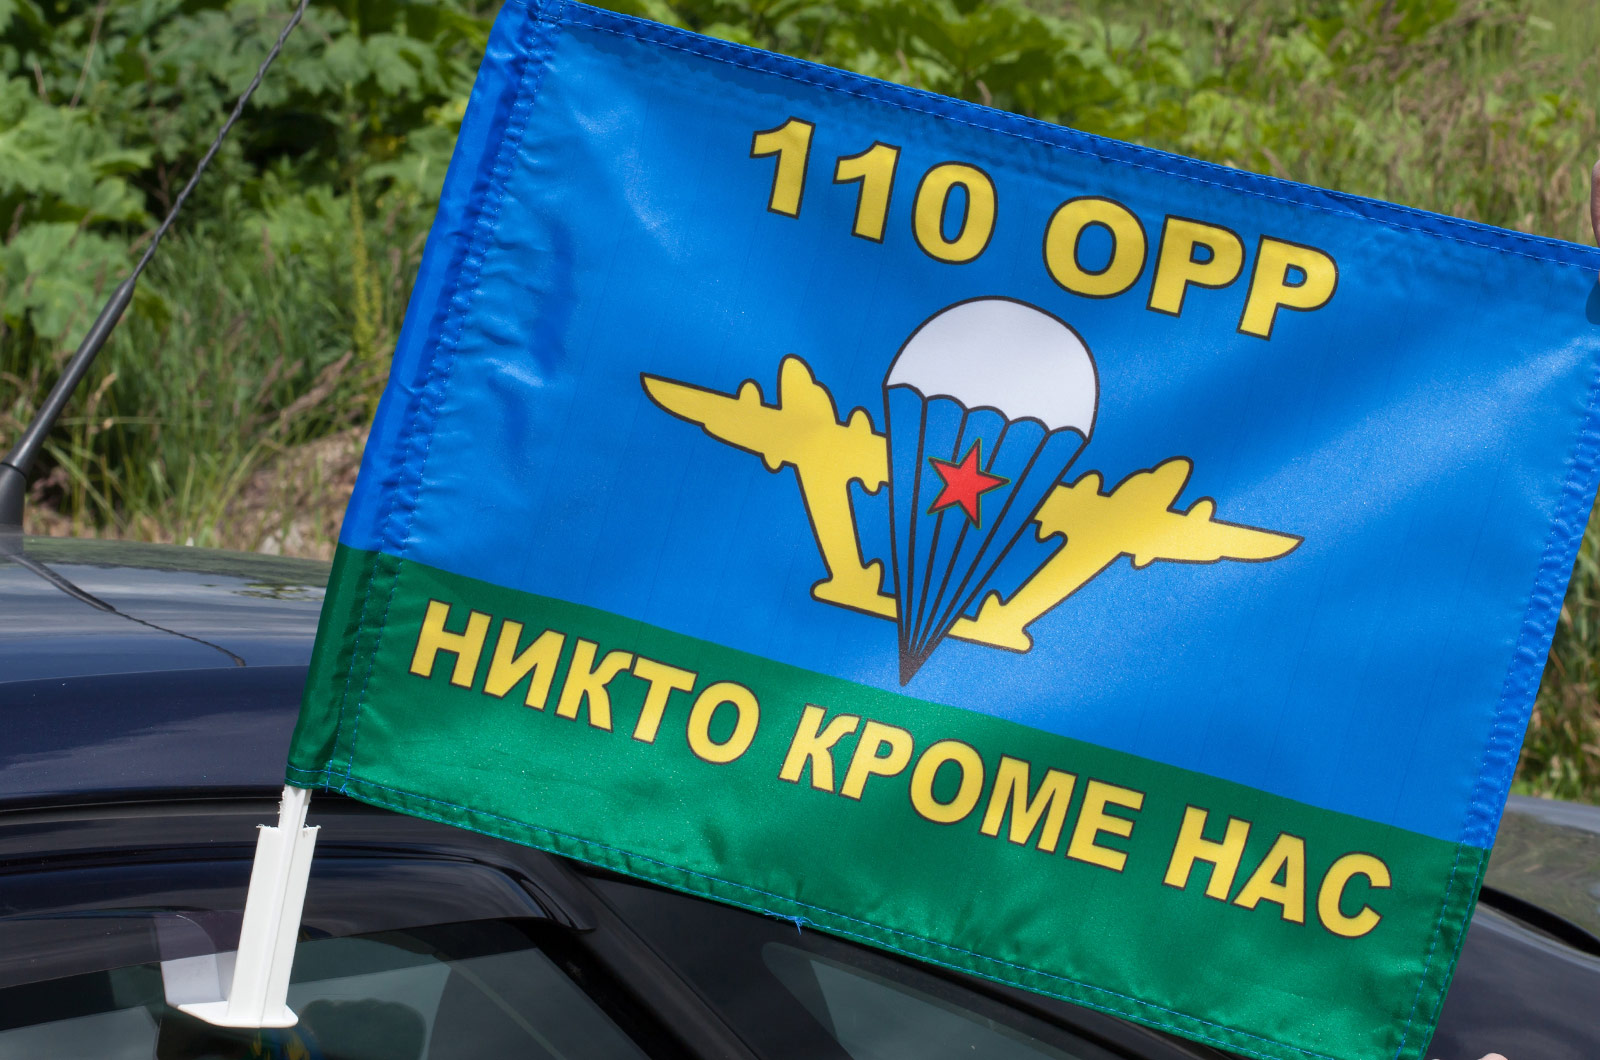 Флаг на машину с кронштейном 110 ОРР ВДВ